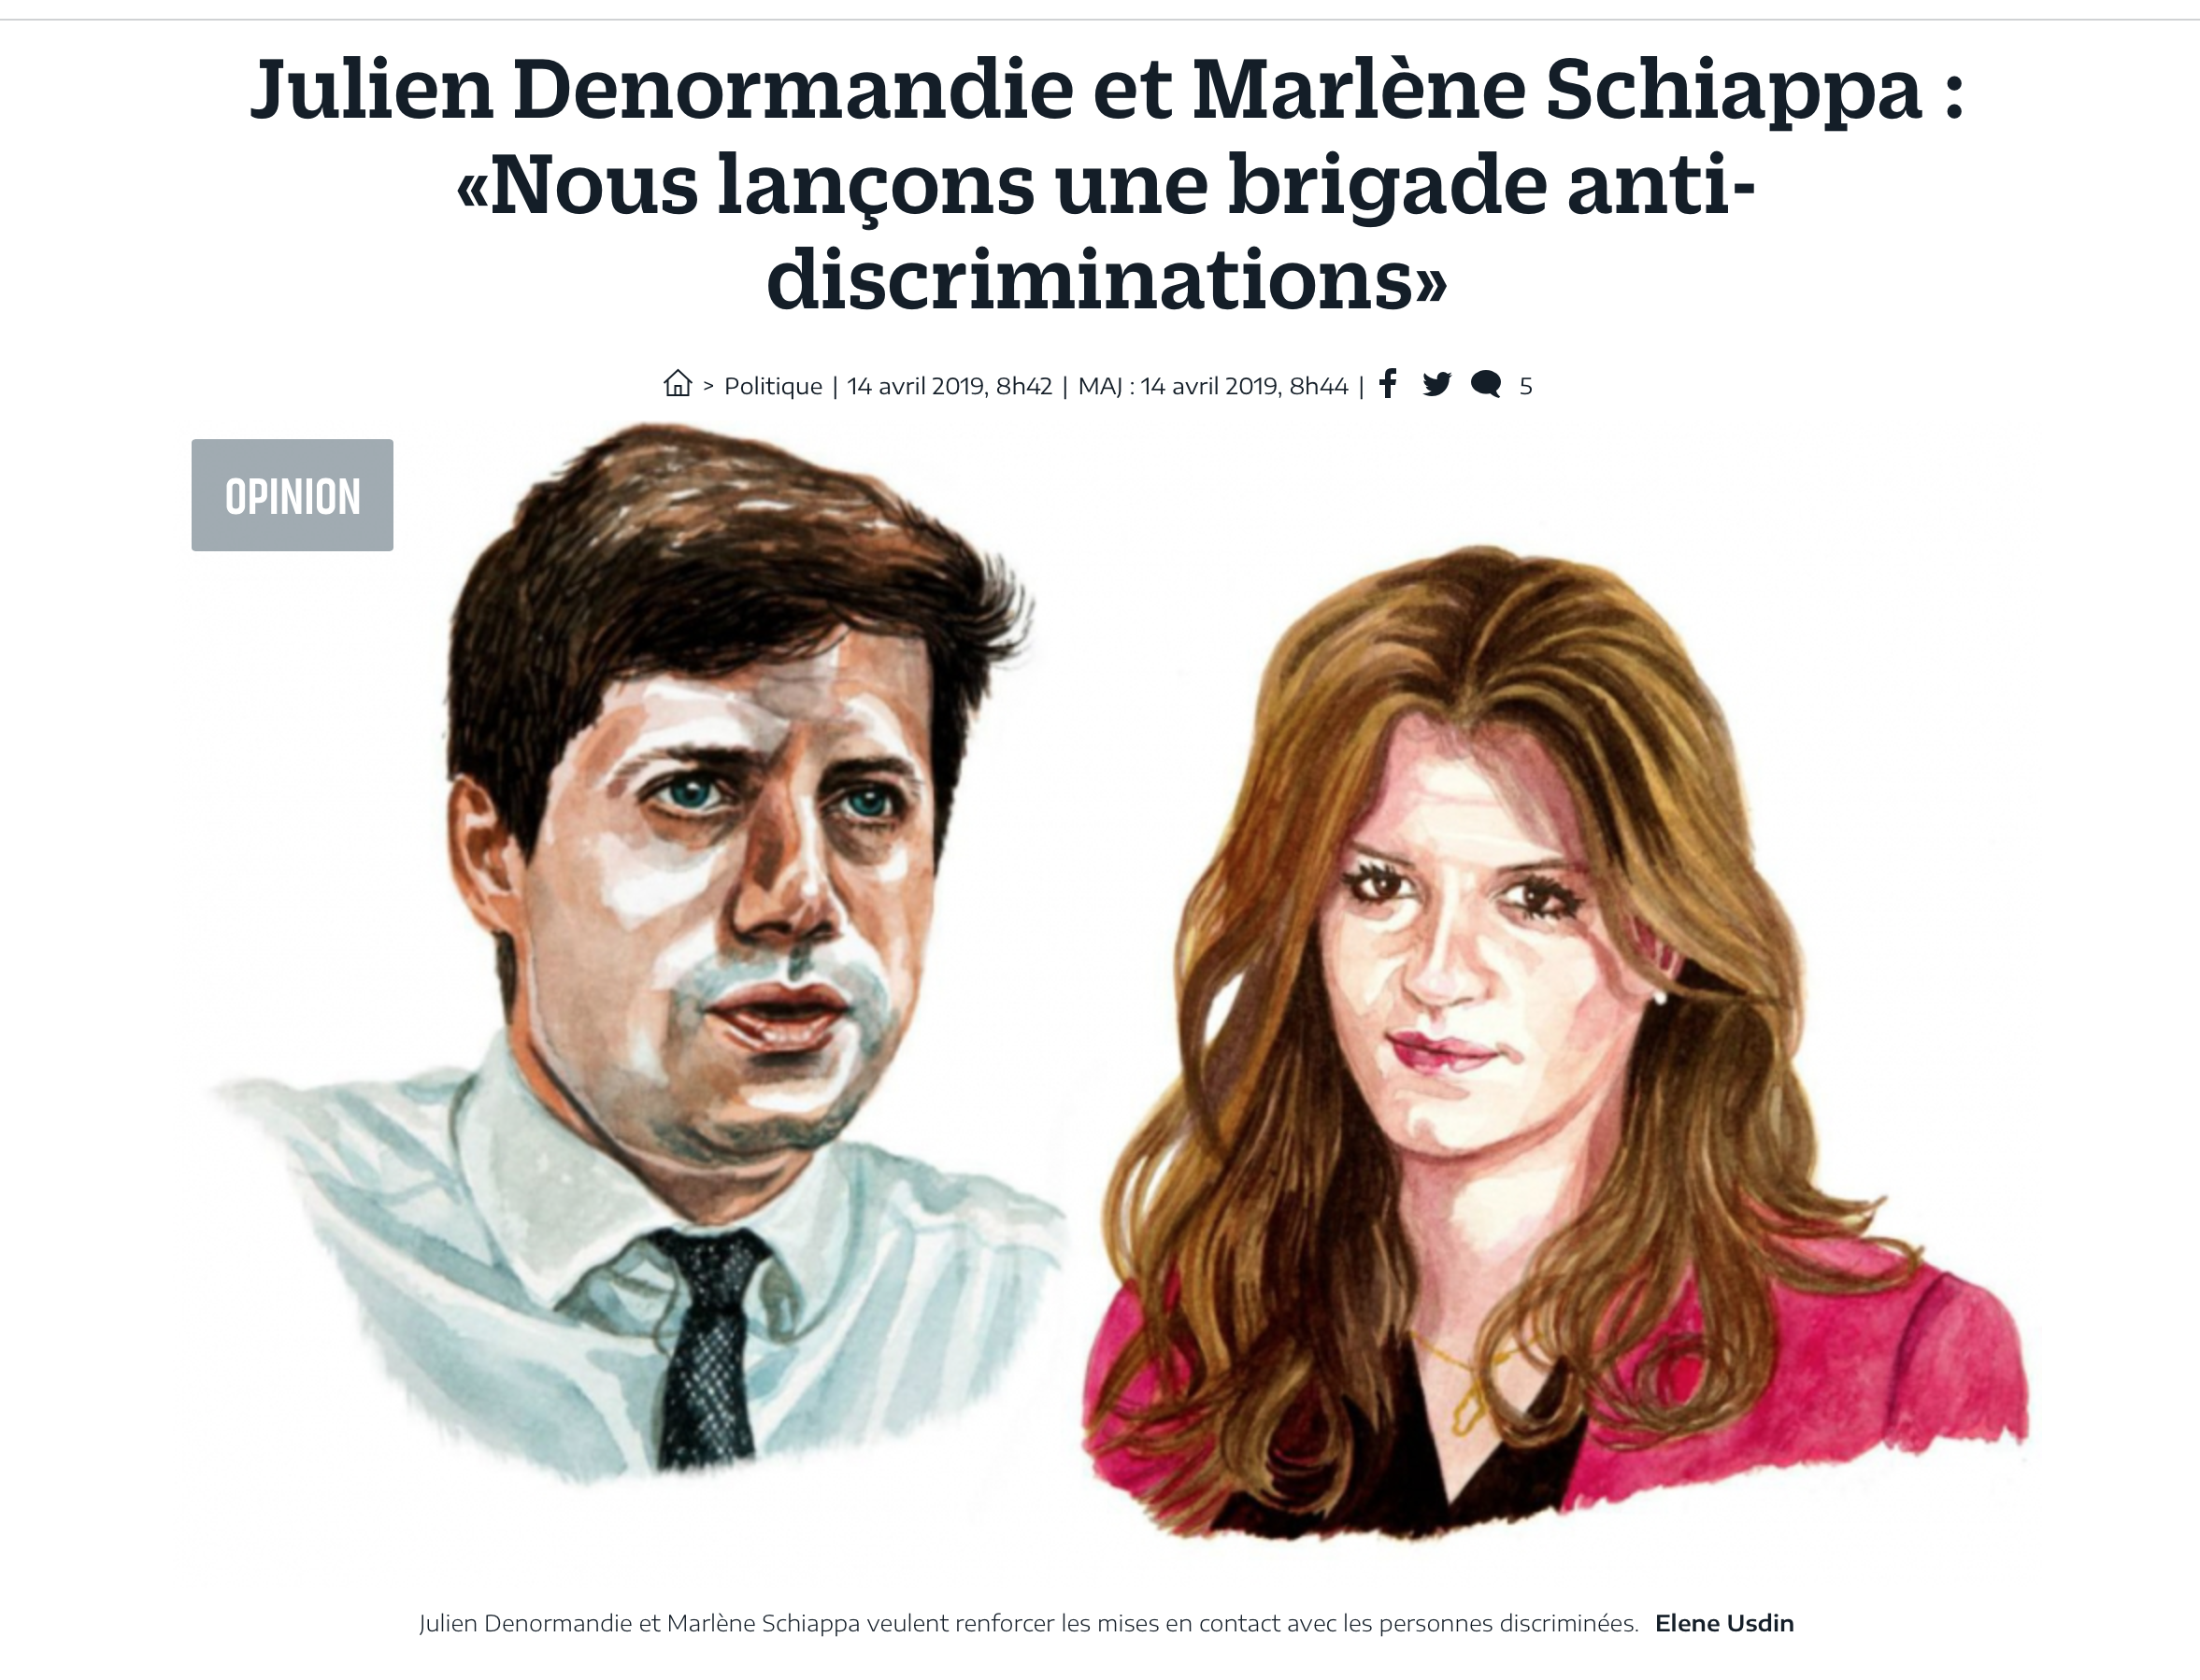 Schiappa lance sa milice anti-discrimination, traduisez «préférence musulmane», la BADI